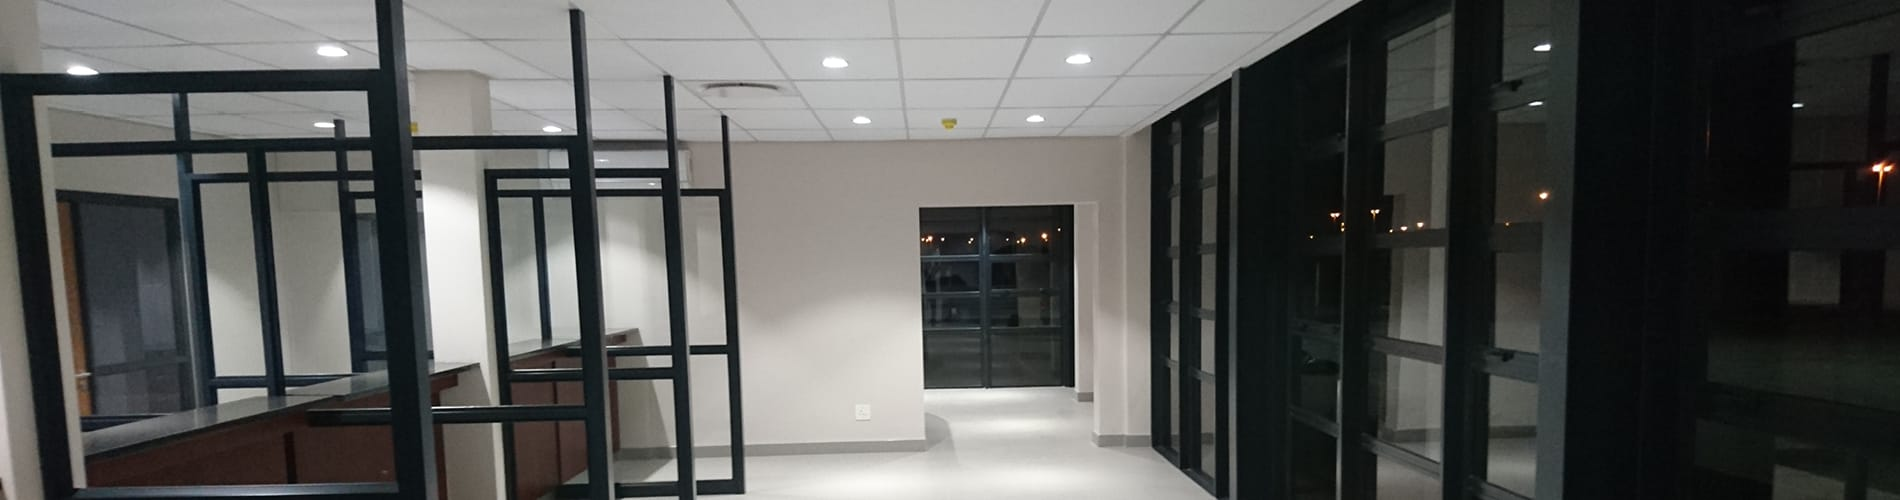 GenLux Lighting Office Lights